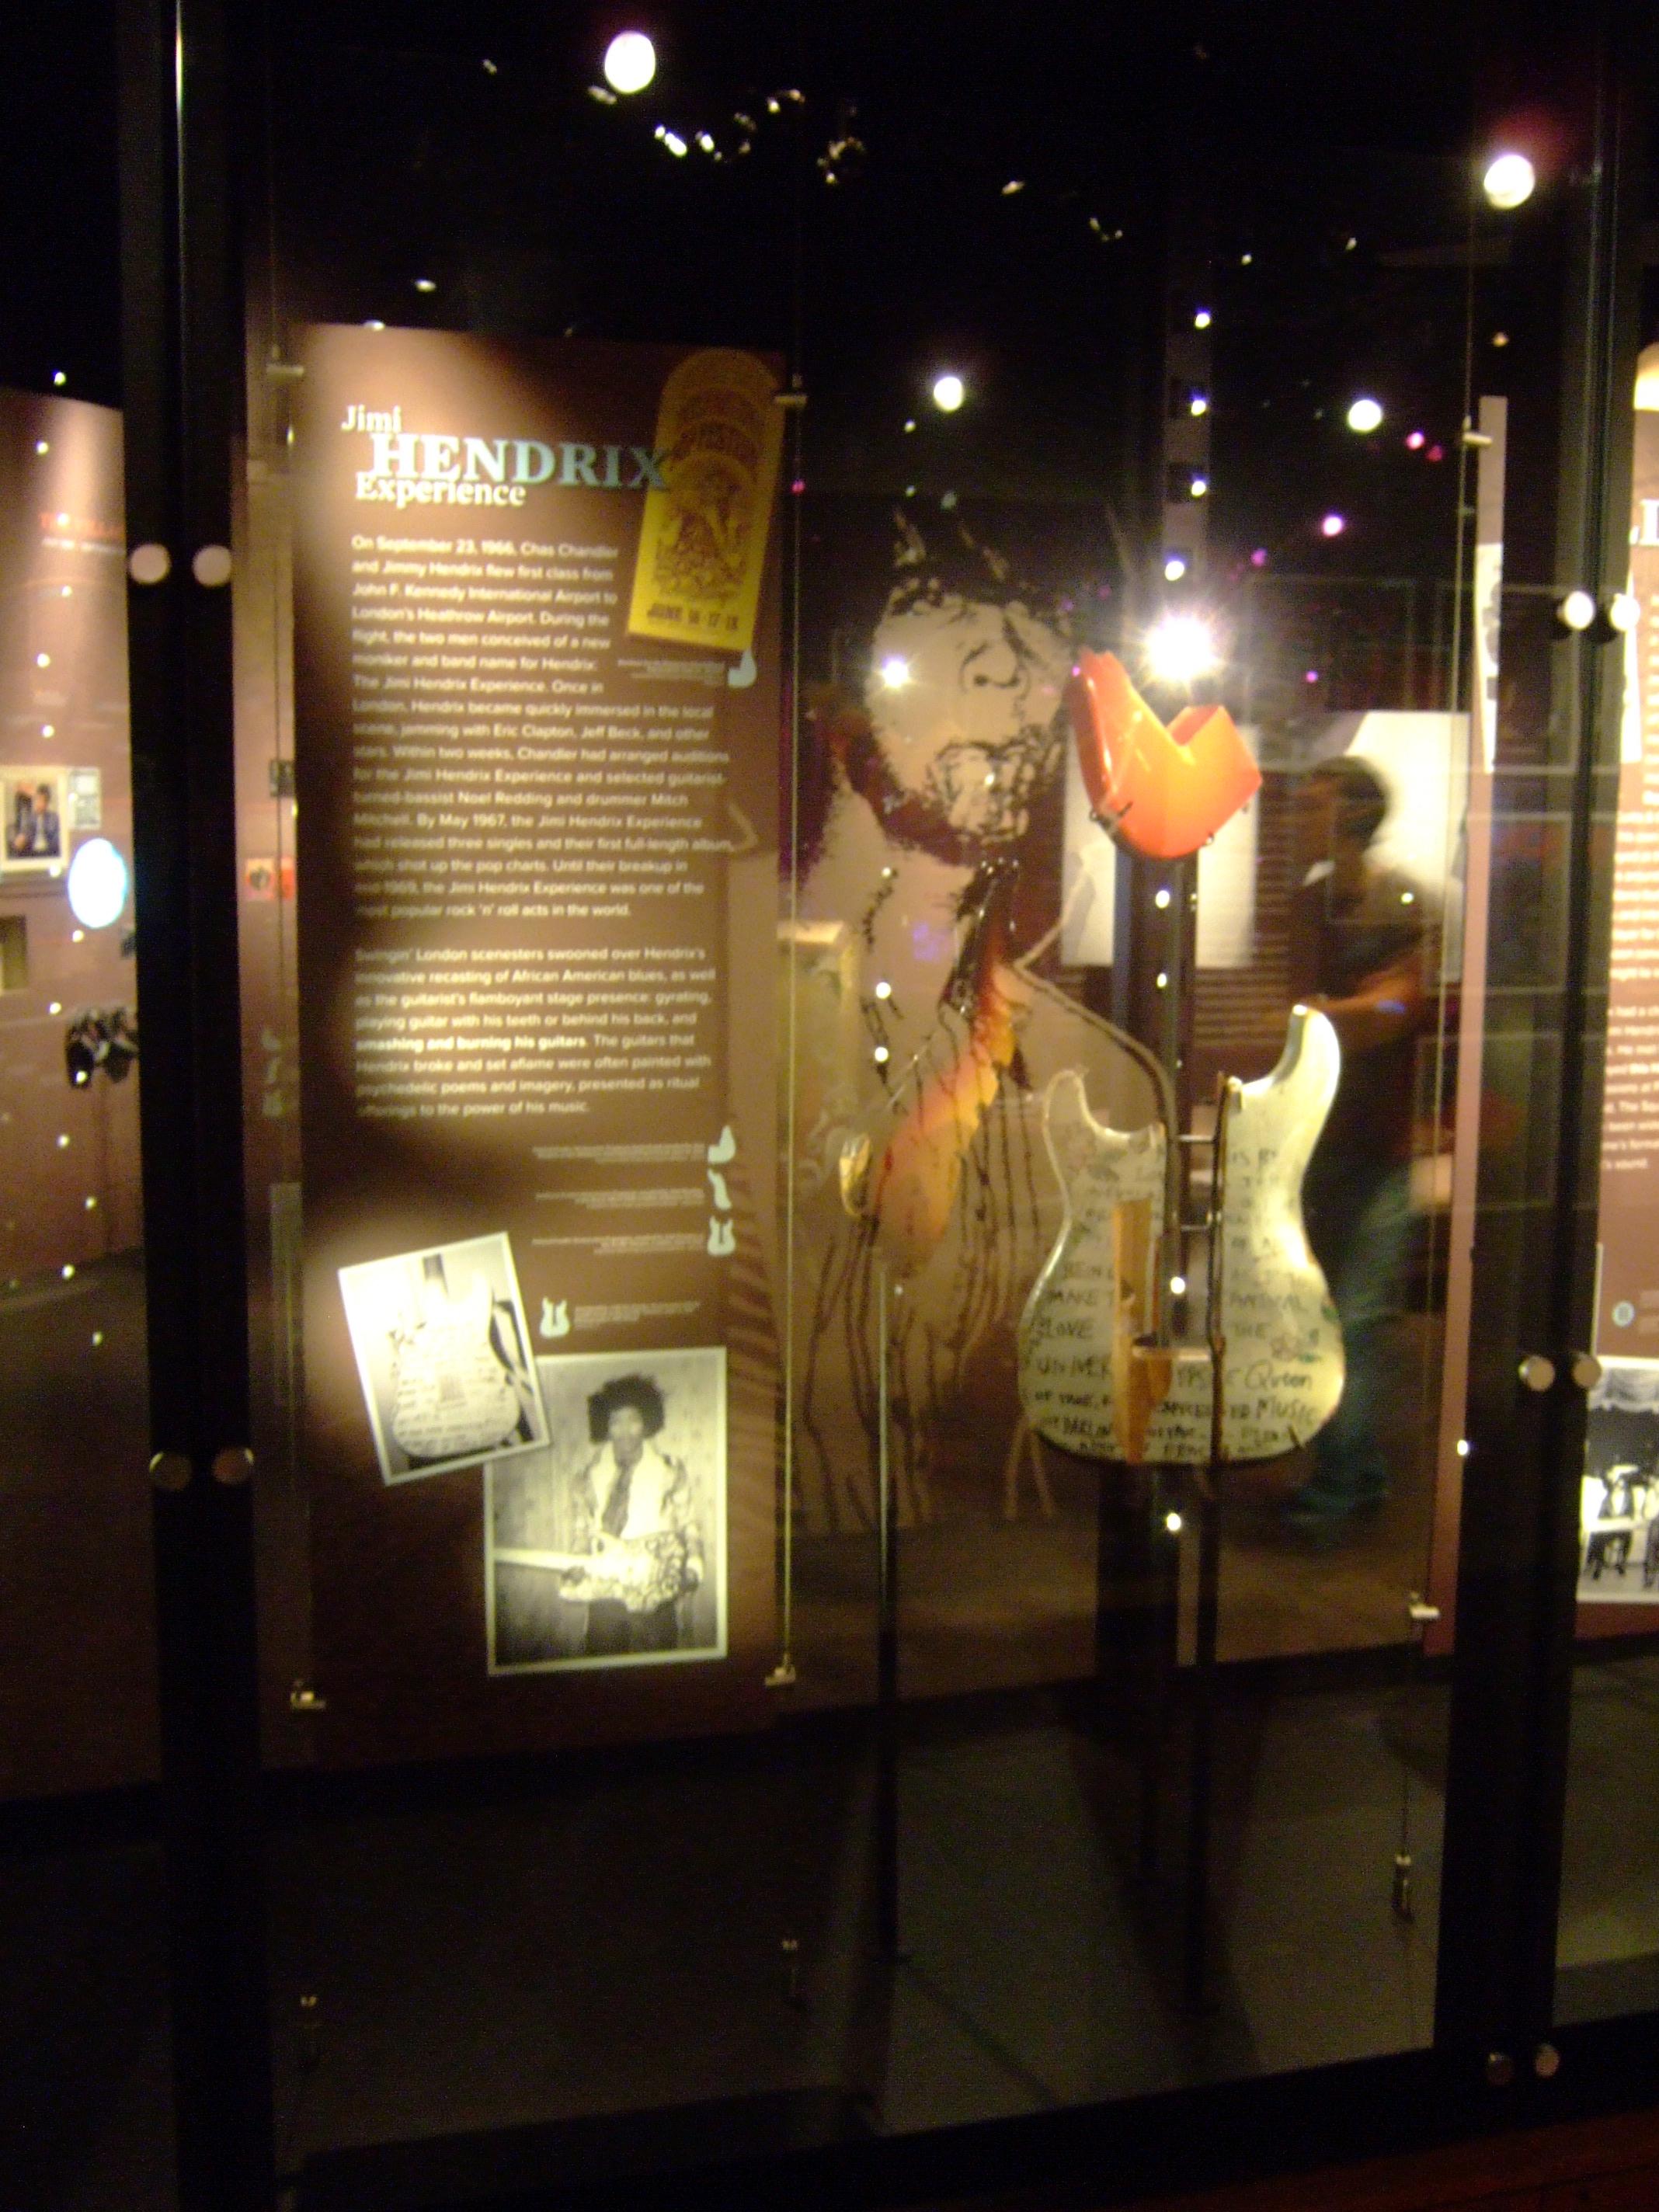 file jimi hendrix smashing guitar pieces rear emp wikimedia commons. Black Bedroom Furniture Sets. Home Design Ideas